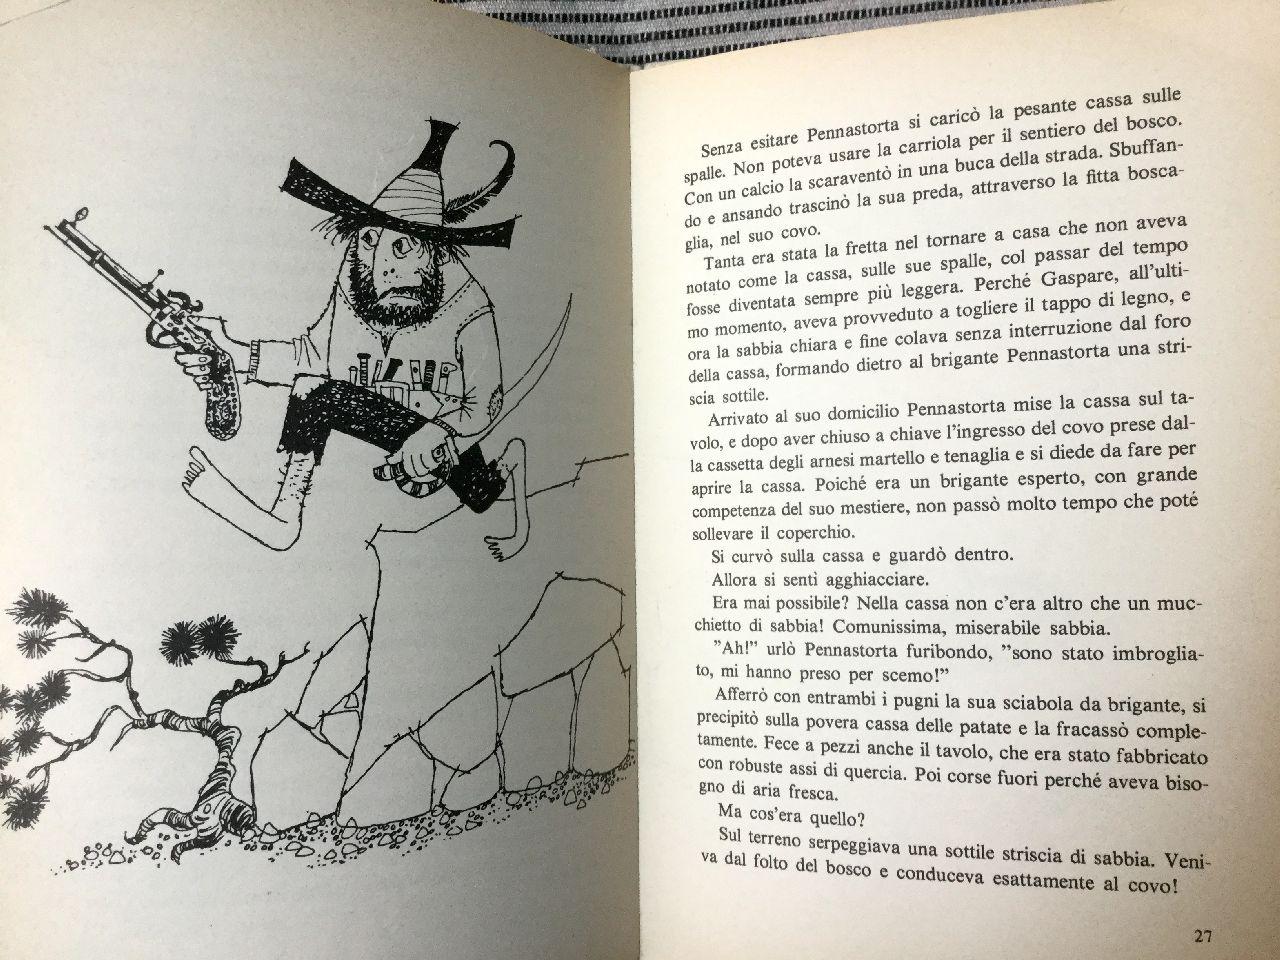 Otfried Preussler,Il brigante Pennastorta, Rizzoli